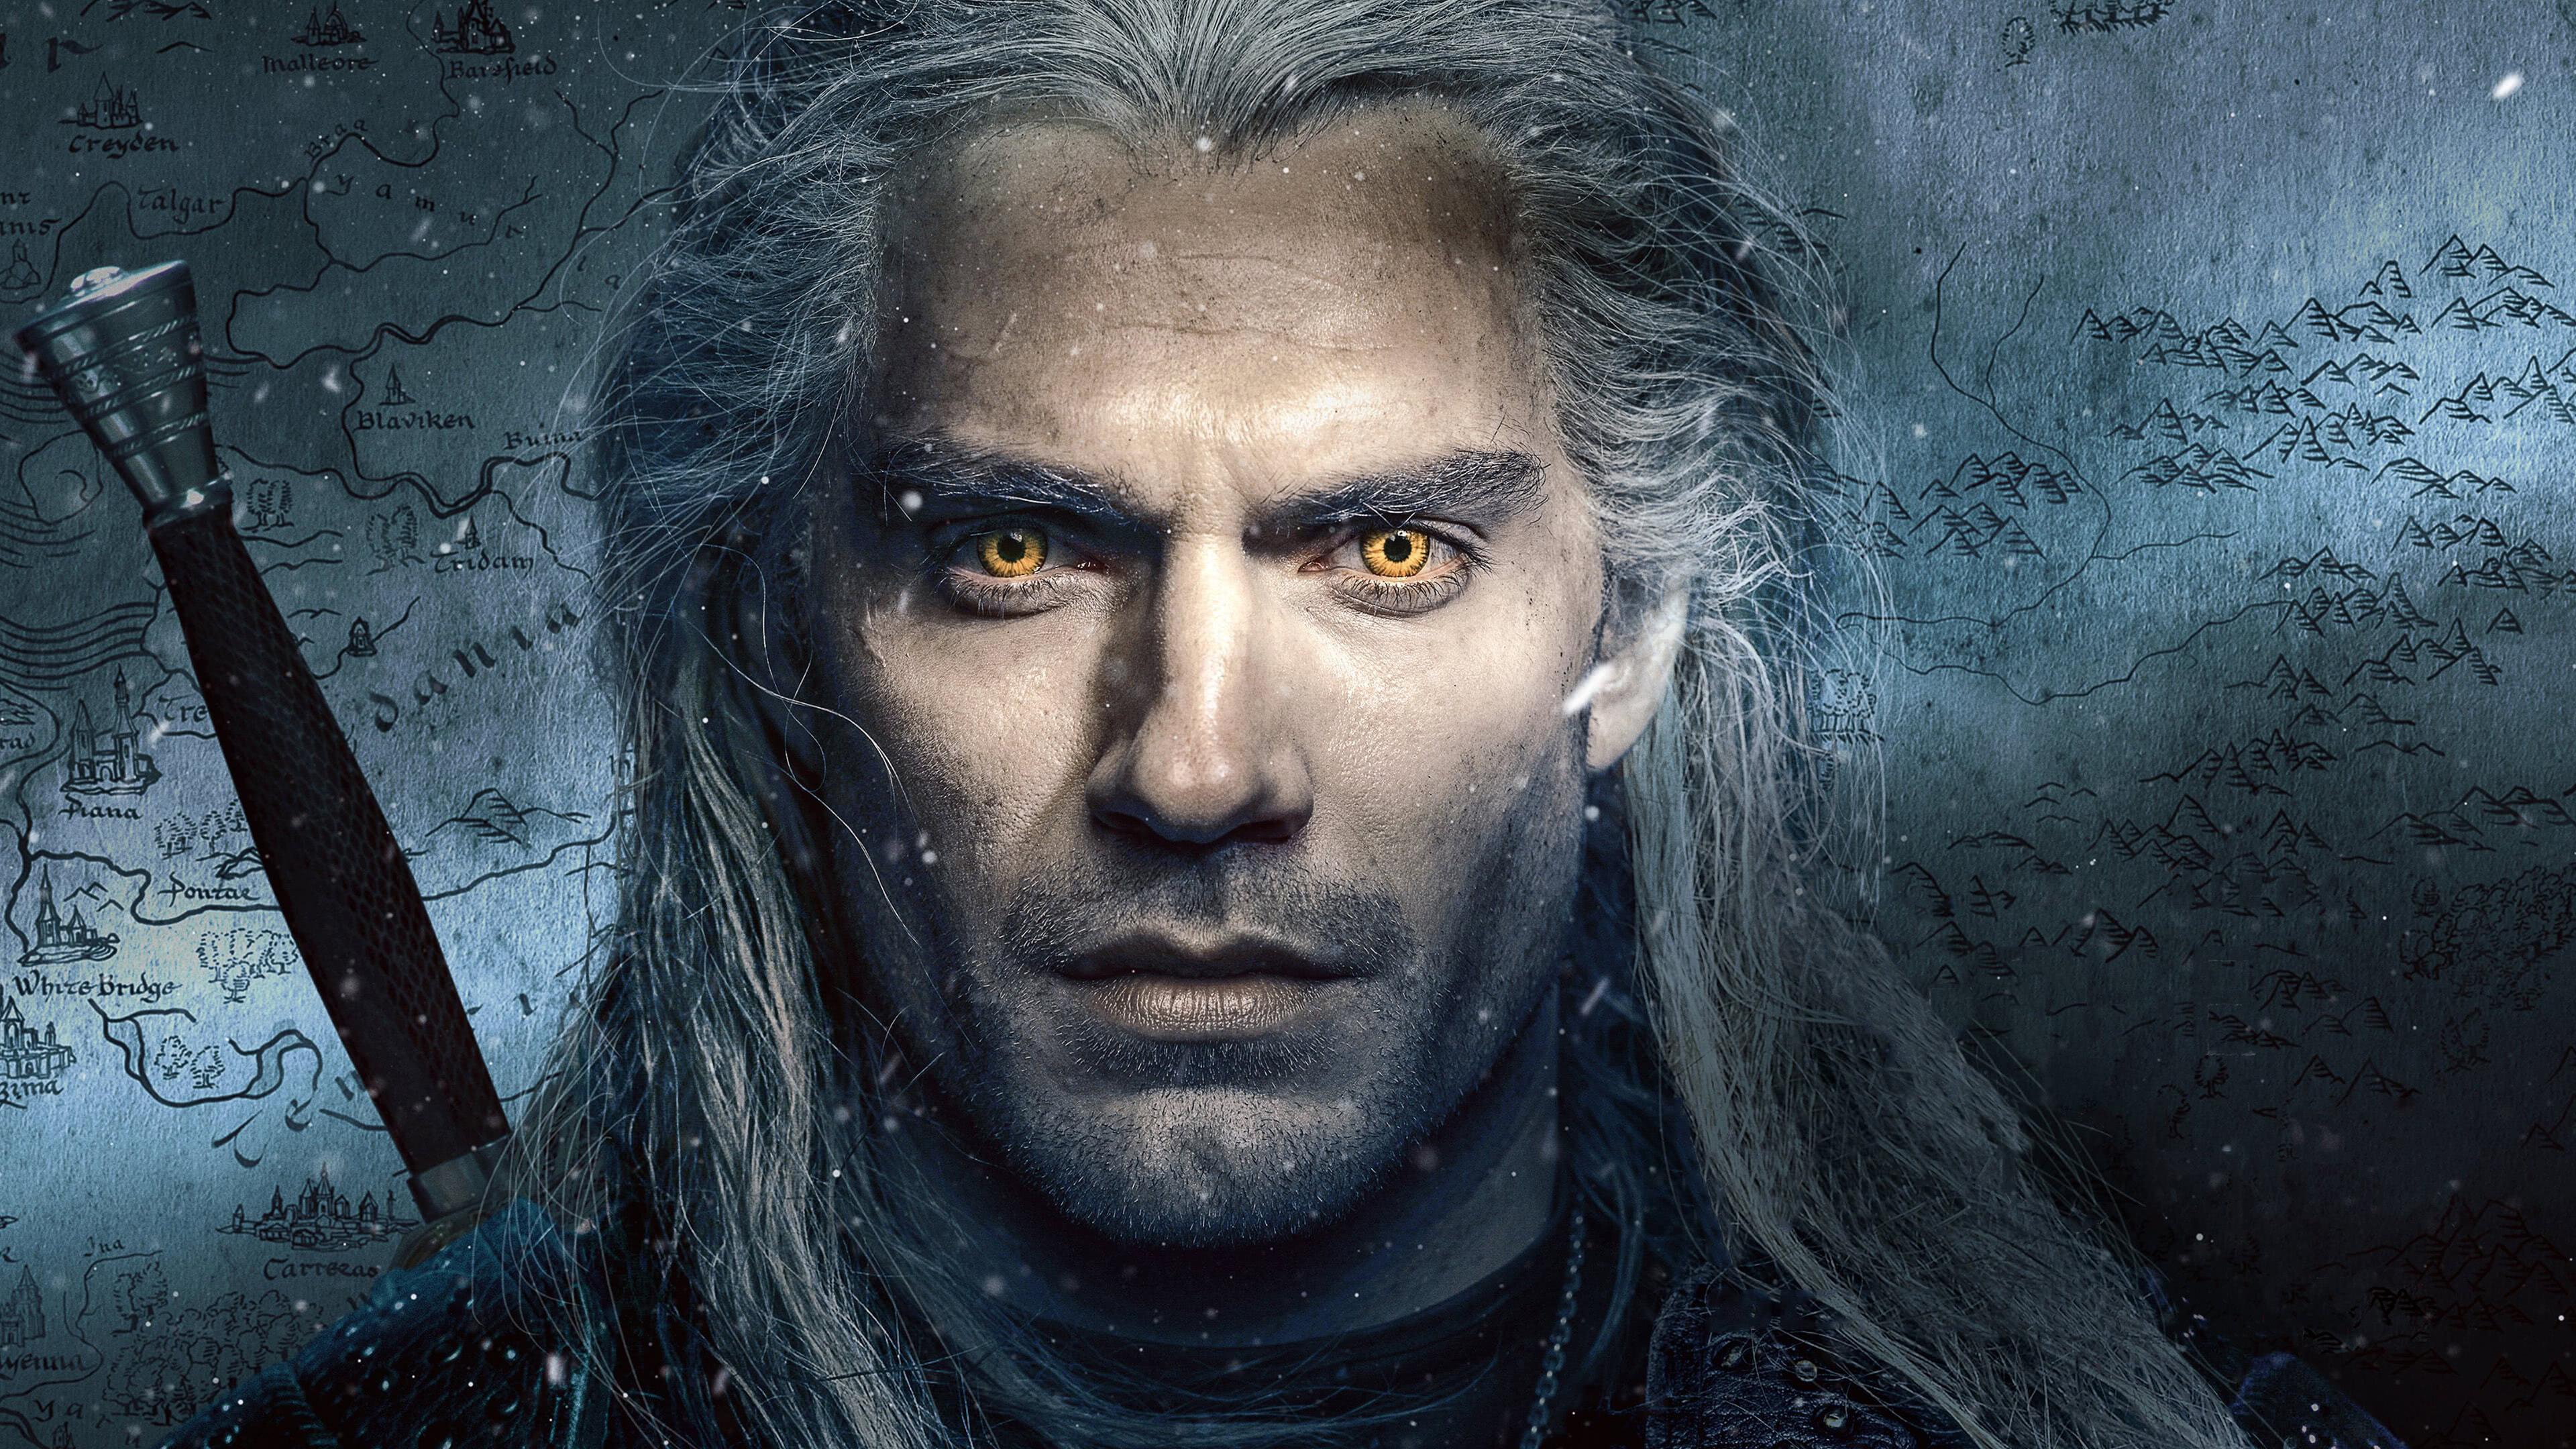 The Witcher Netflix Henry Cavill Portrait Uhd 4k Wallpaper Pixelz